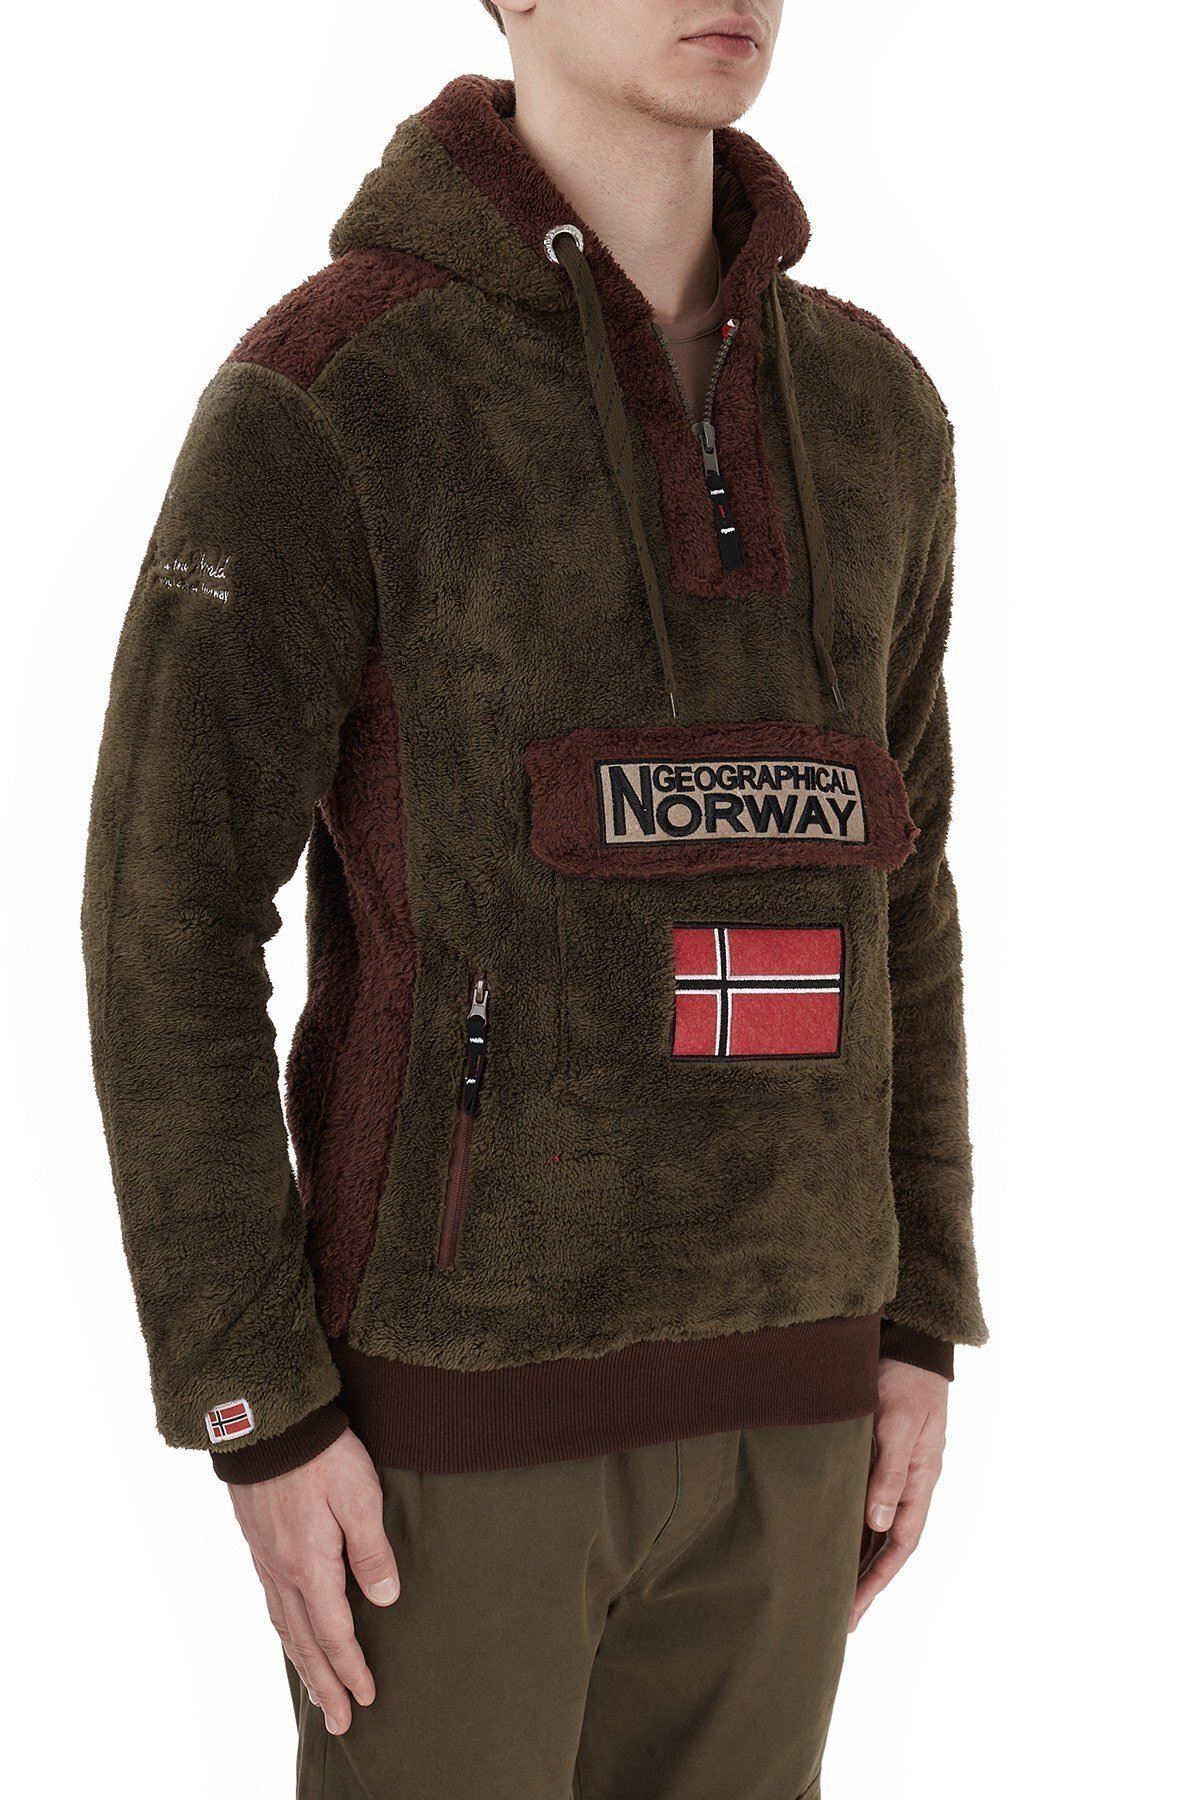 Norway Geographical Kapüşonlu Outdoor Polar Erkek Sweat GYMCLASS E HAKİ